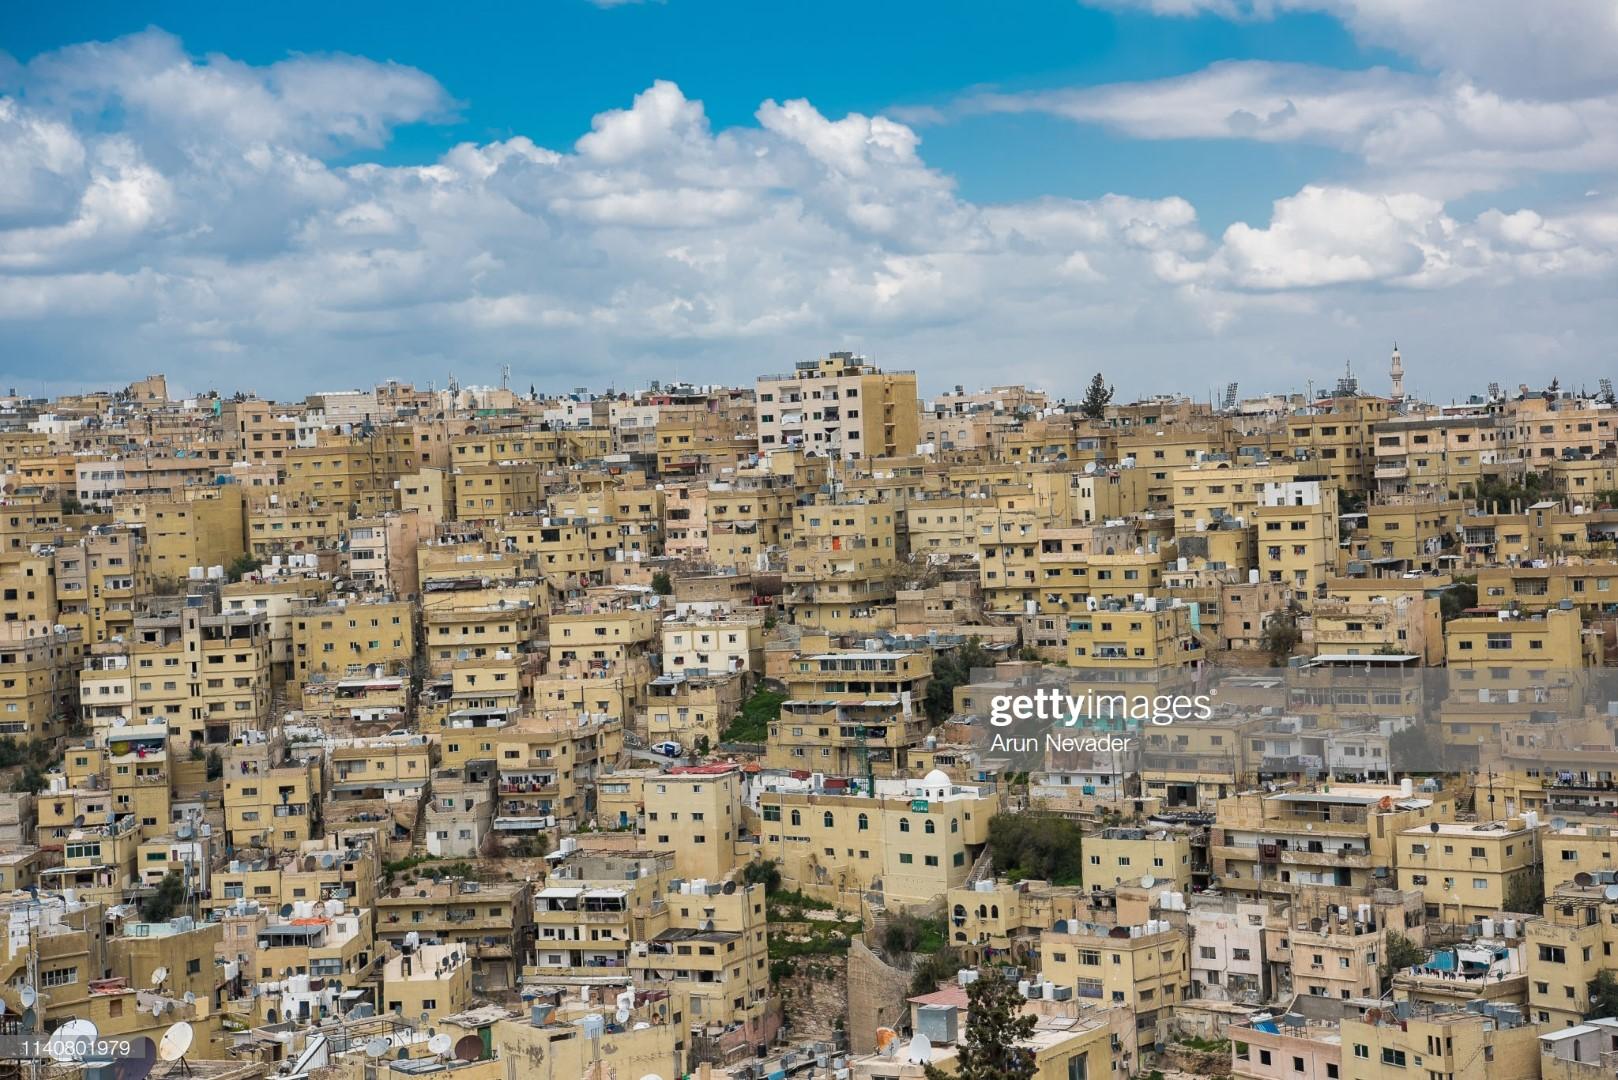 AMMAN, JORDAN - APRIL 02: A view of the city on April 2, 2019 in Amman, Jordan. (Photo by Arun Nevader/Getty Images for Jordan Fashion Week)